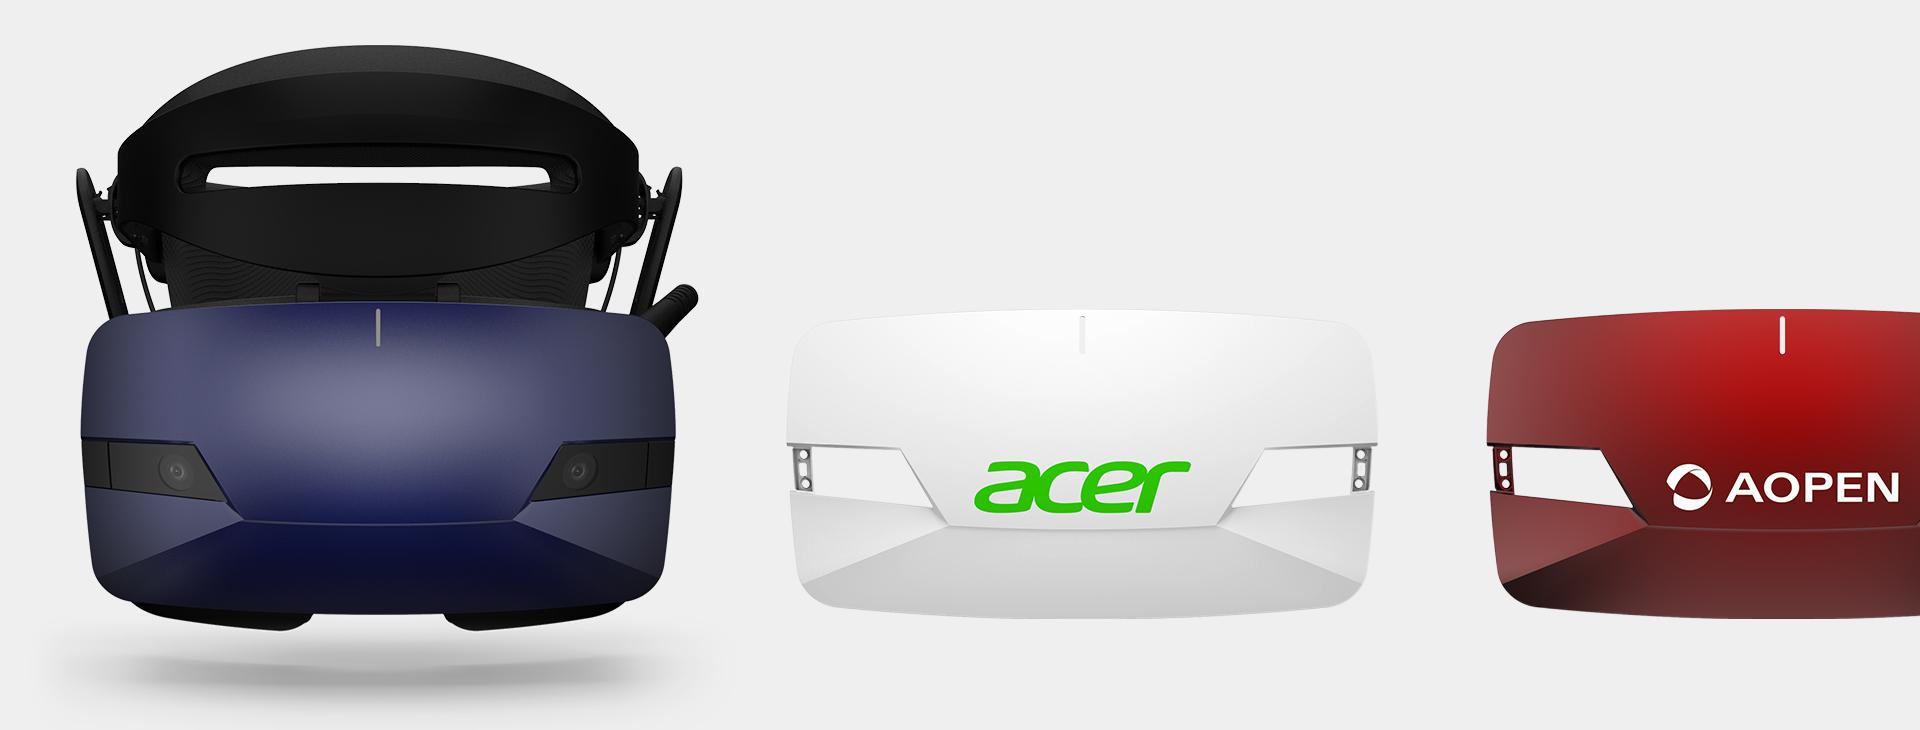 Acer OJO 500 - Windows Mixed Reality Benefits - Large